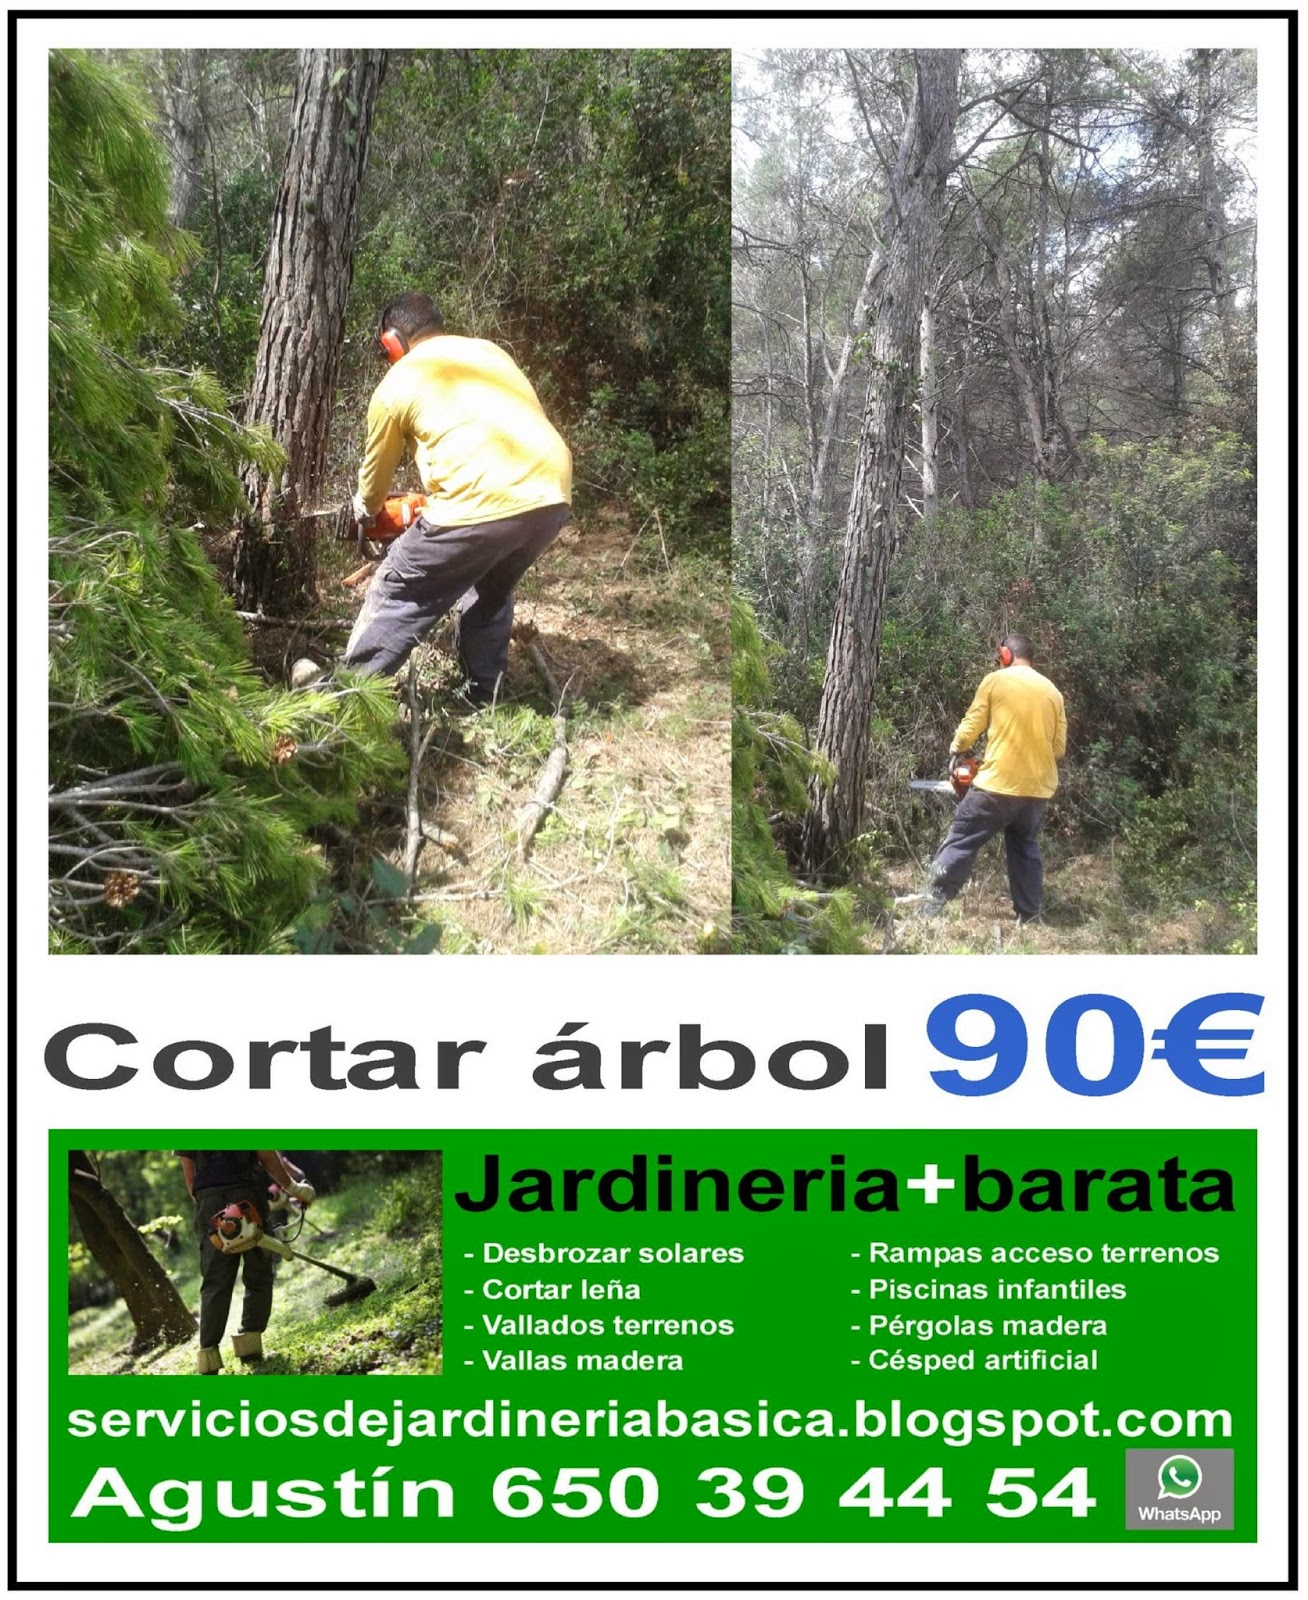 Serviciosdejardineriabasica jardineria barata 90 cortar for Jardineria barata barcelona